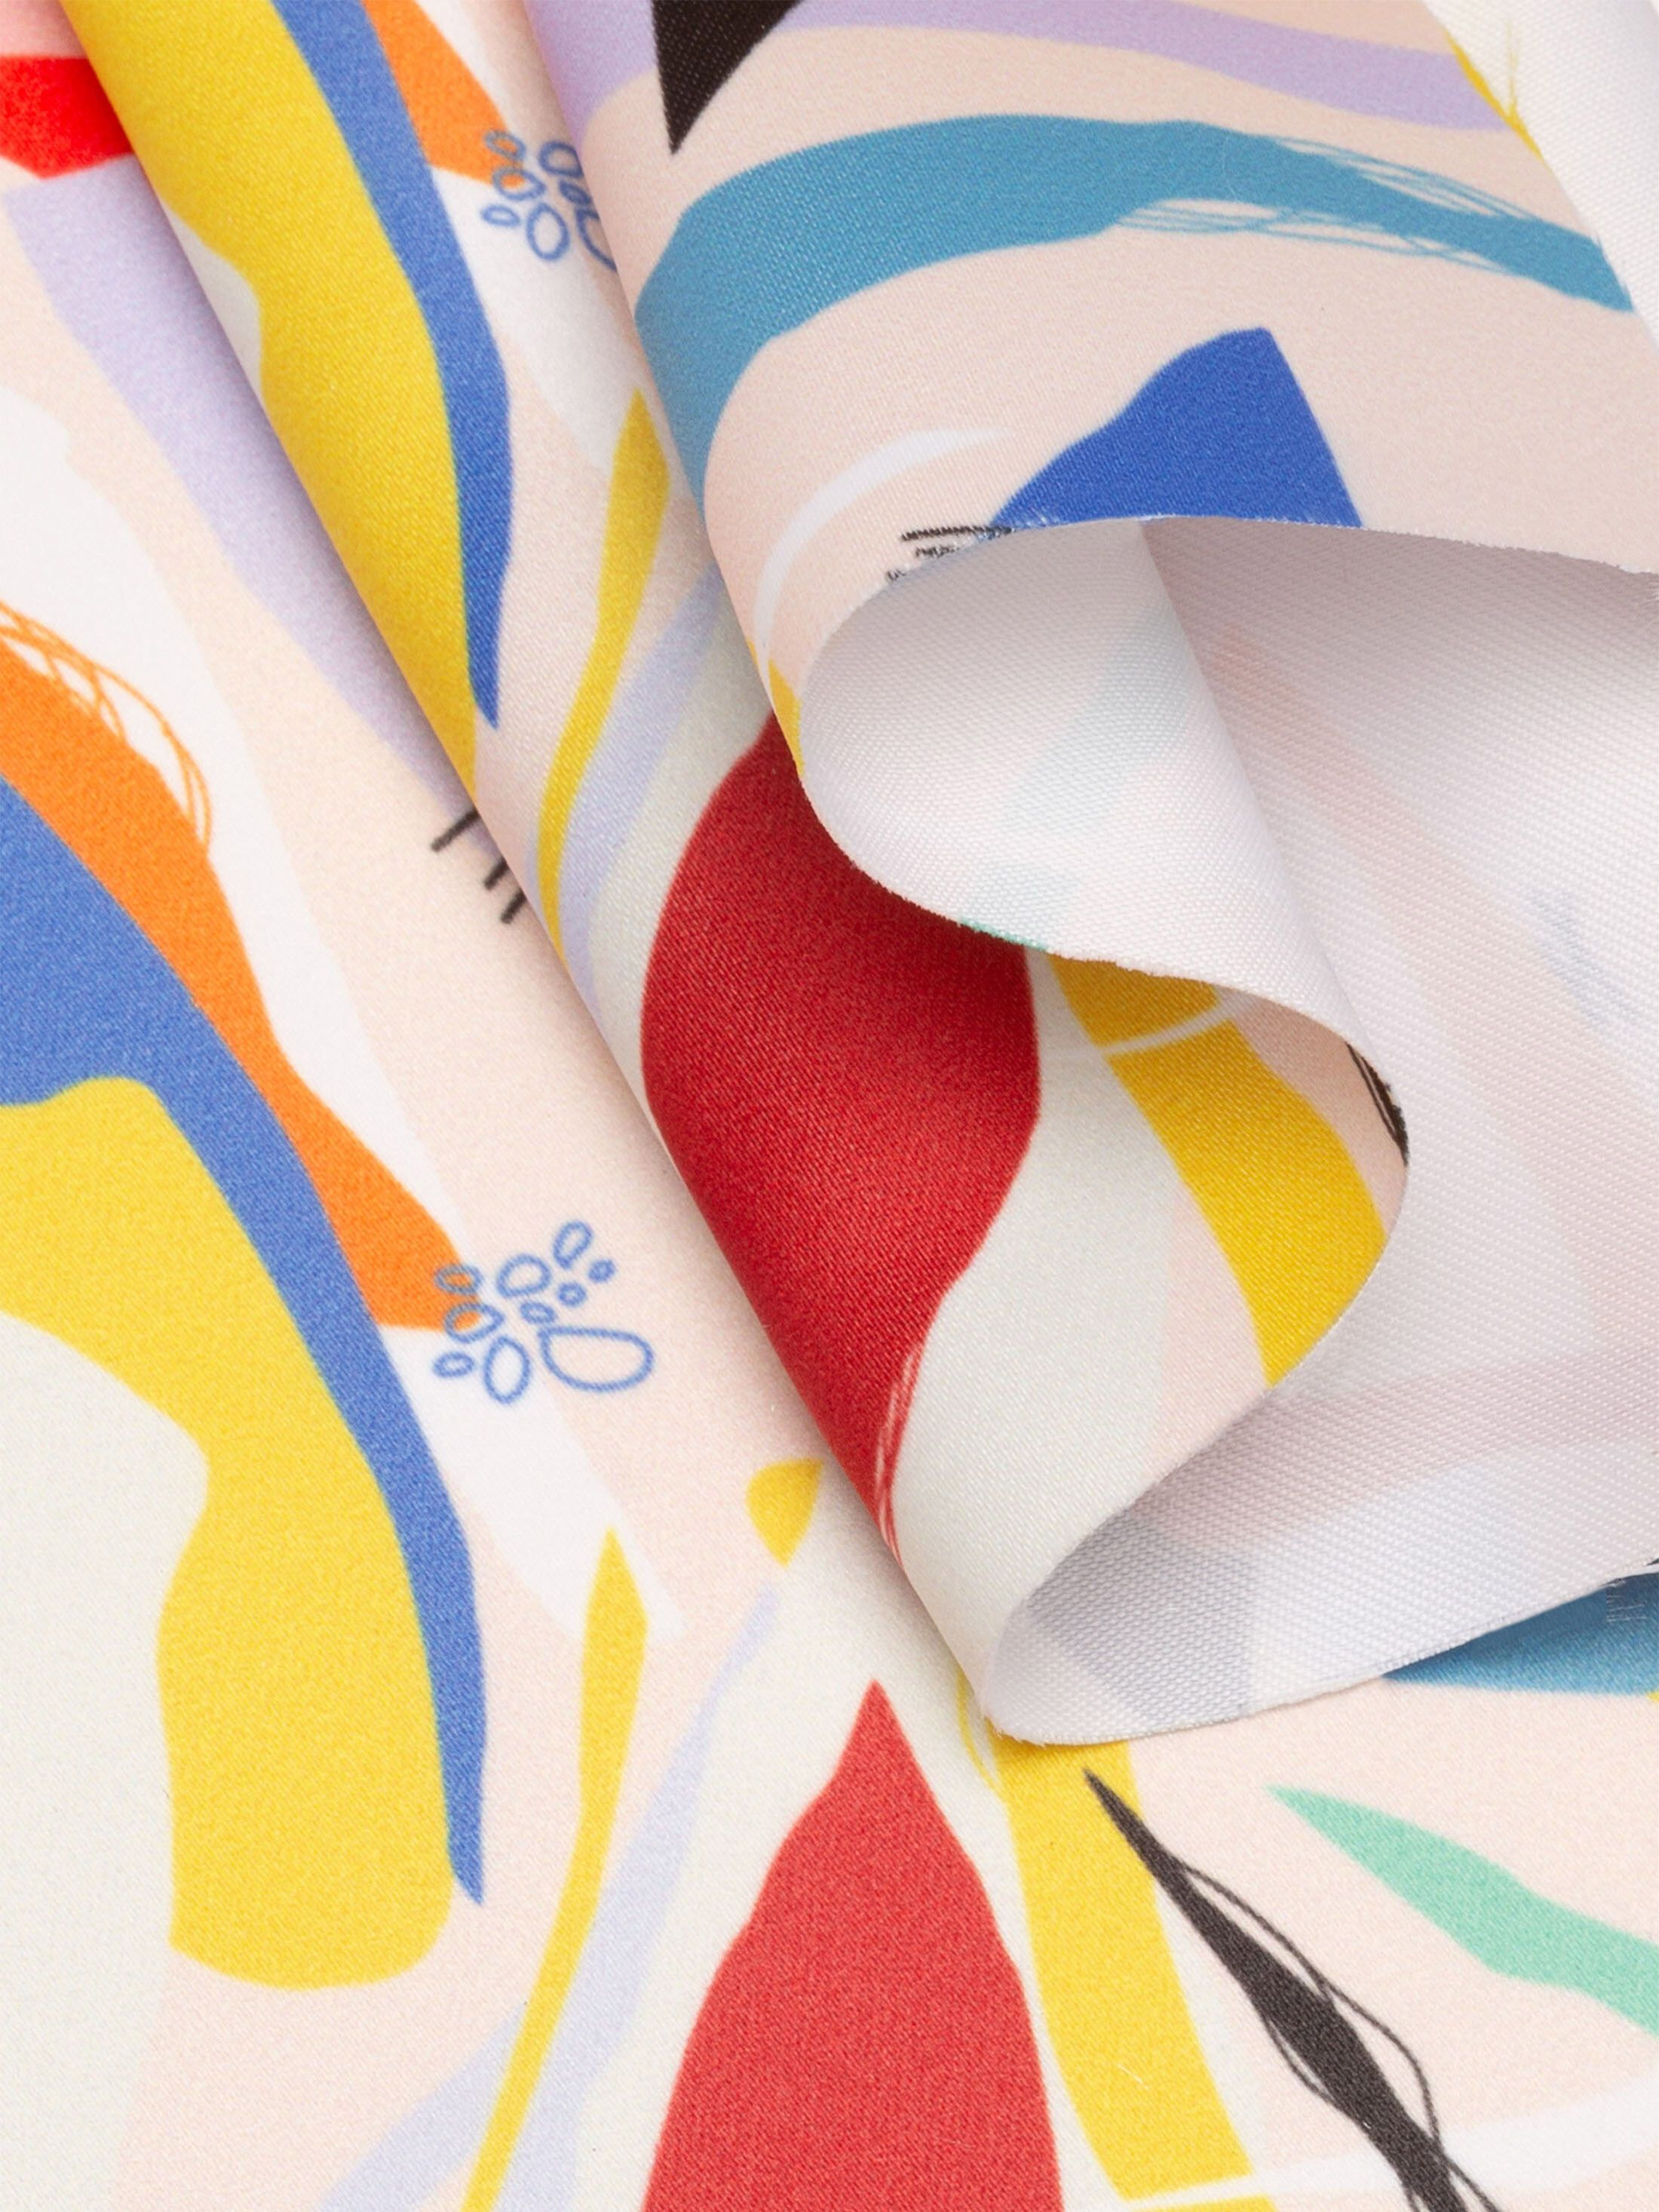 folding Duchess Satin edge options